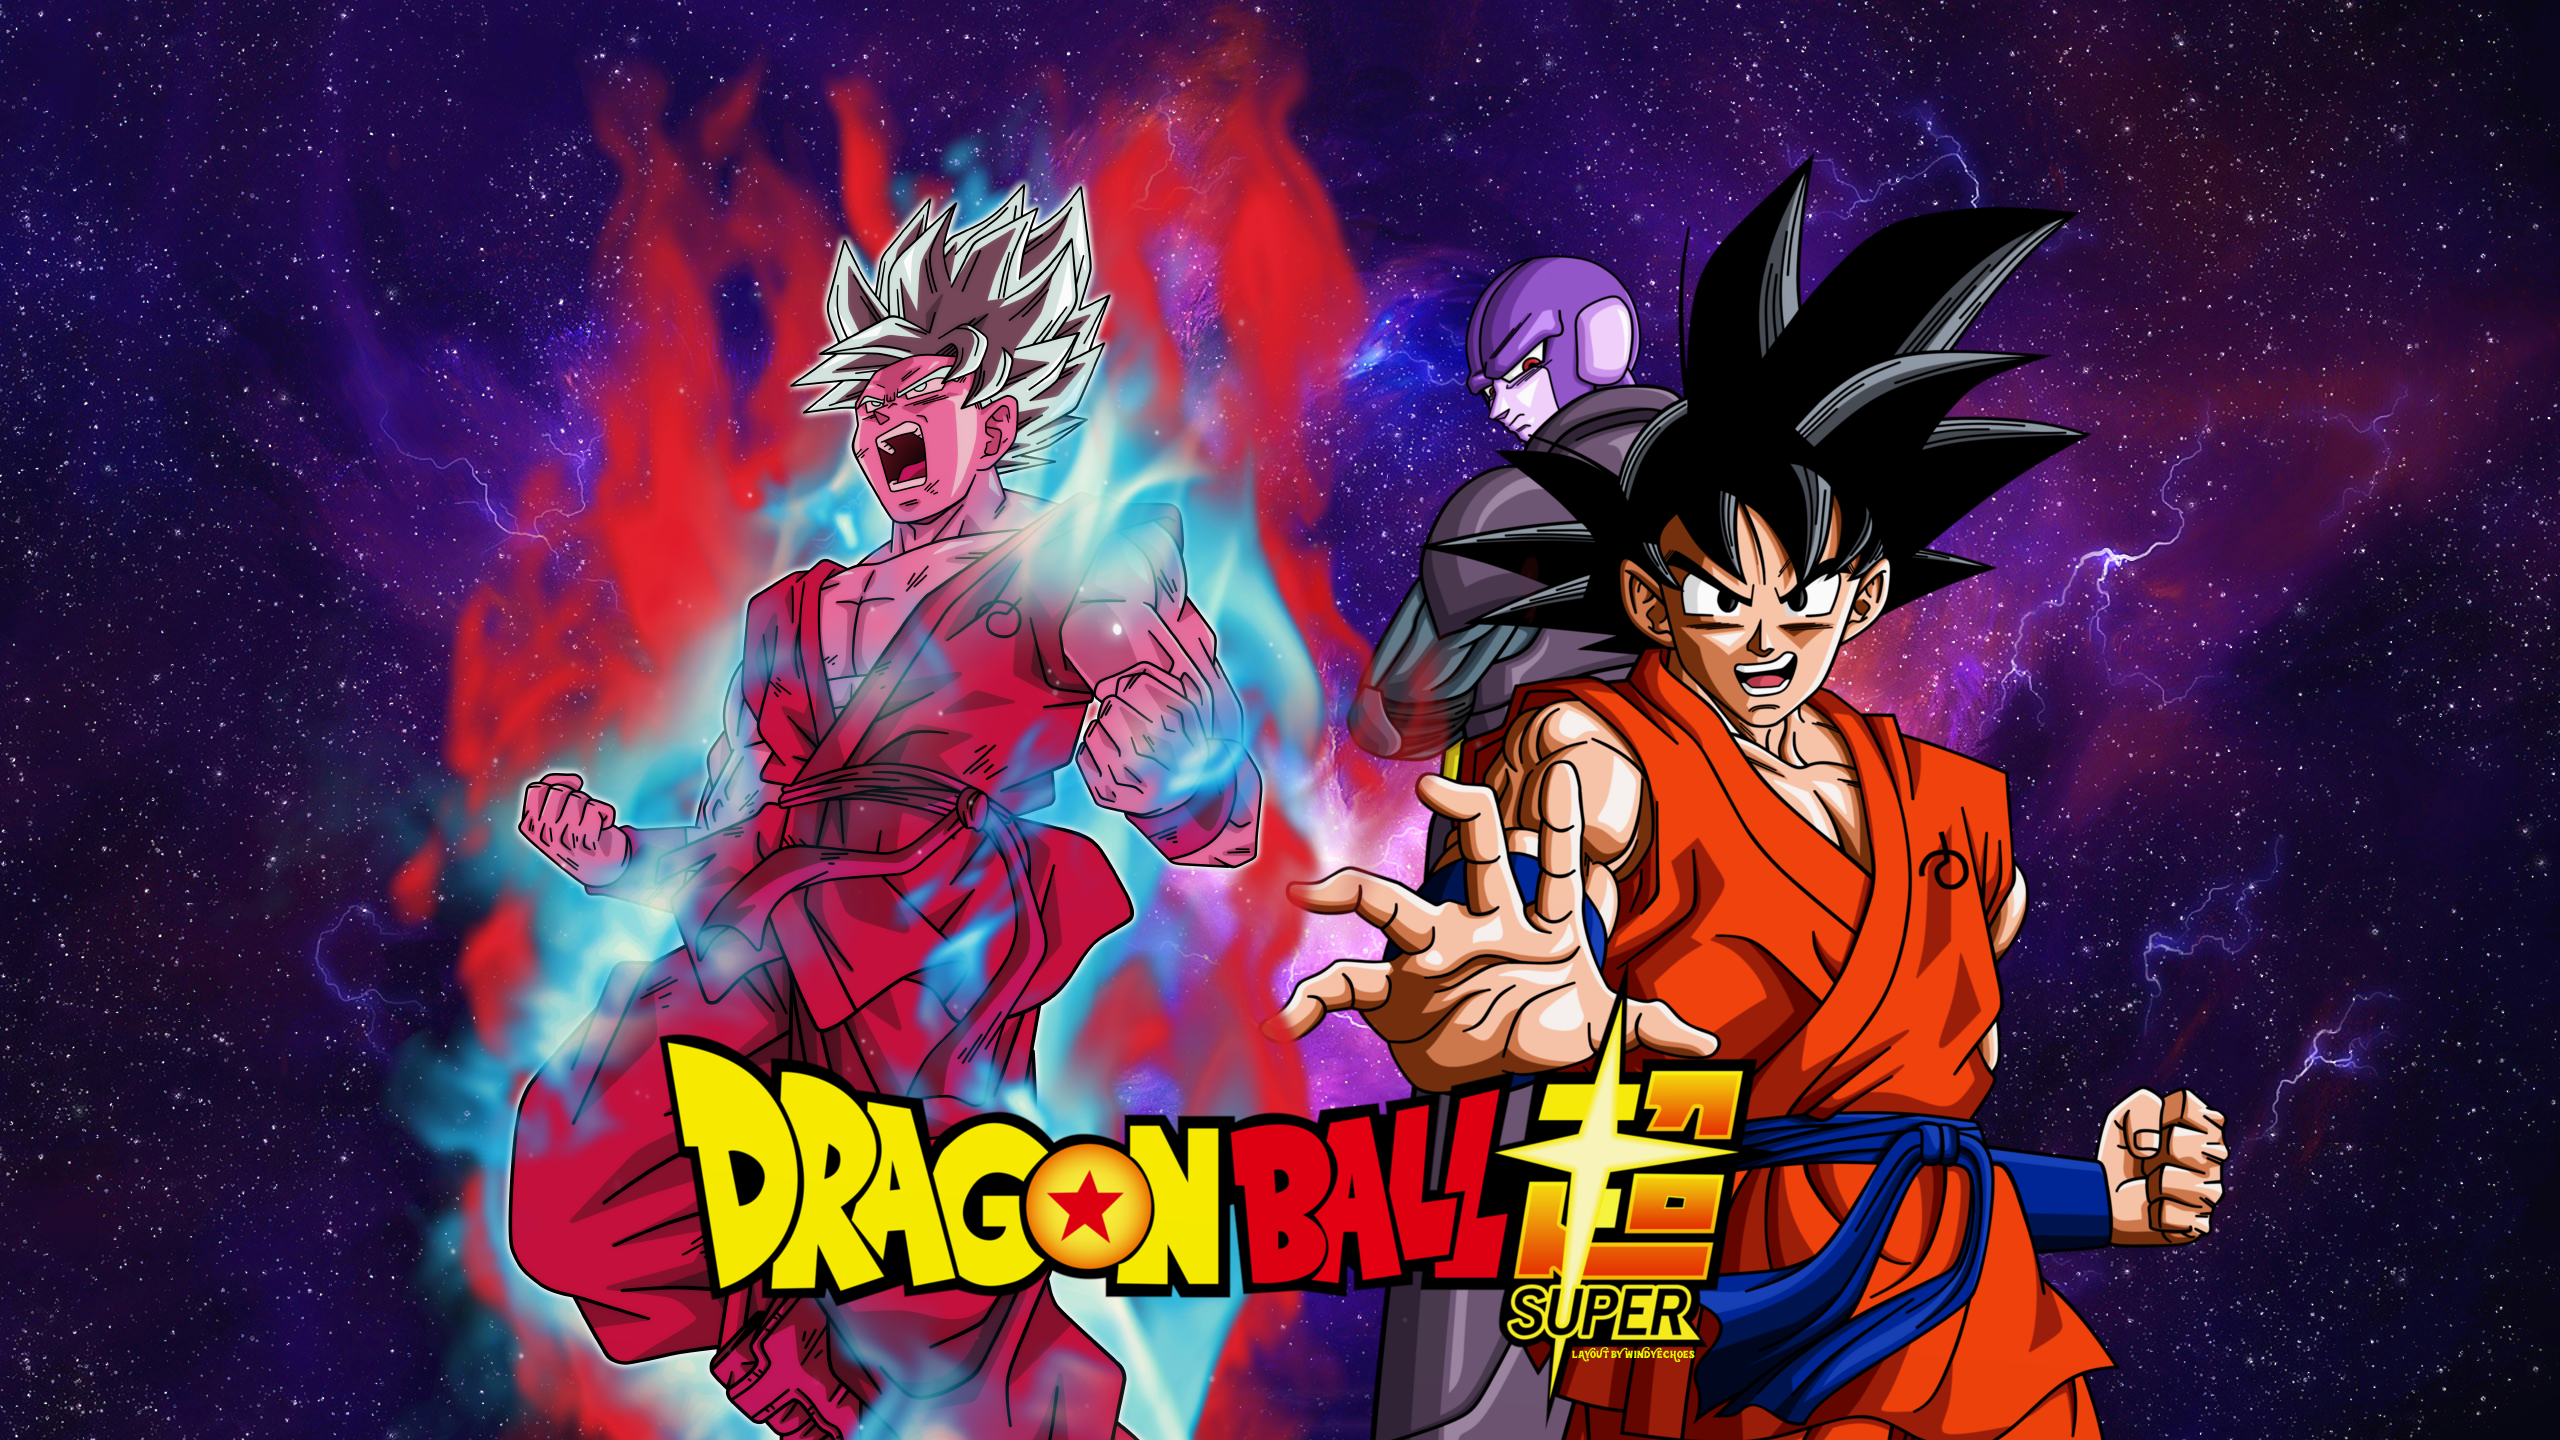 Dragon Ball Super Hd Wallpaper Background Image 2560x1440 Id